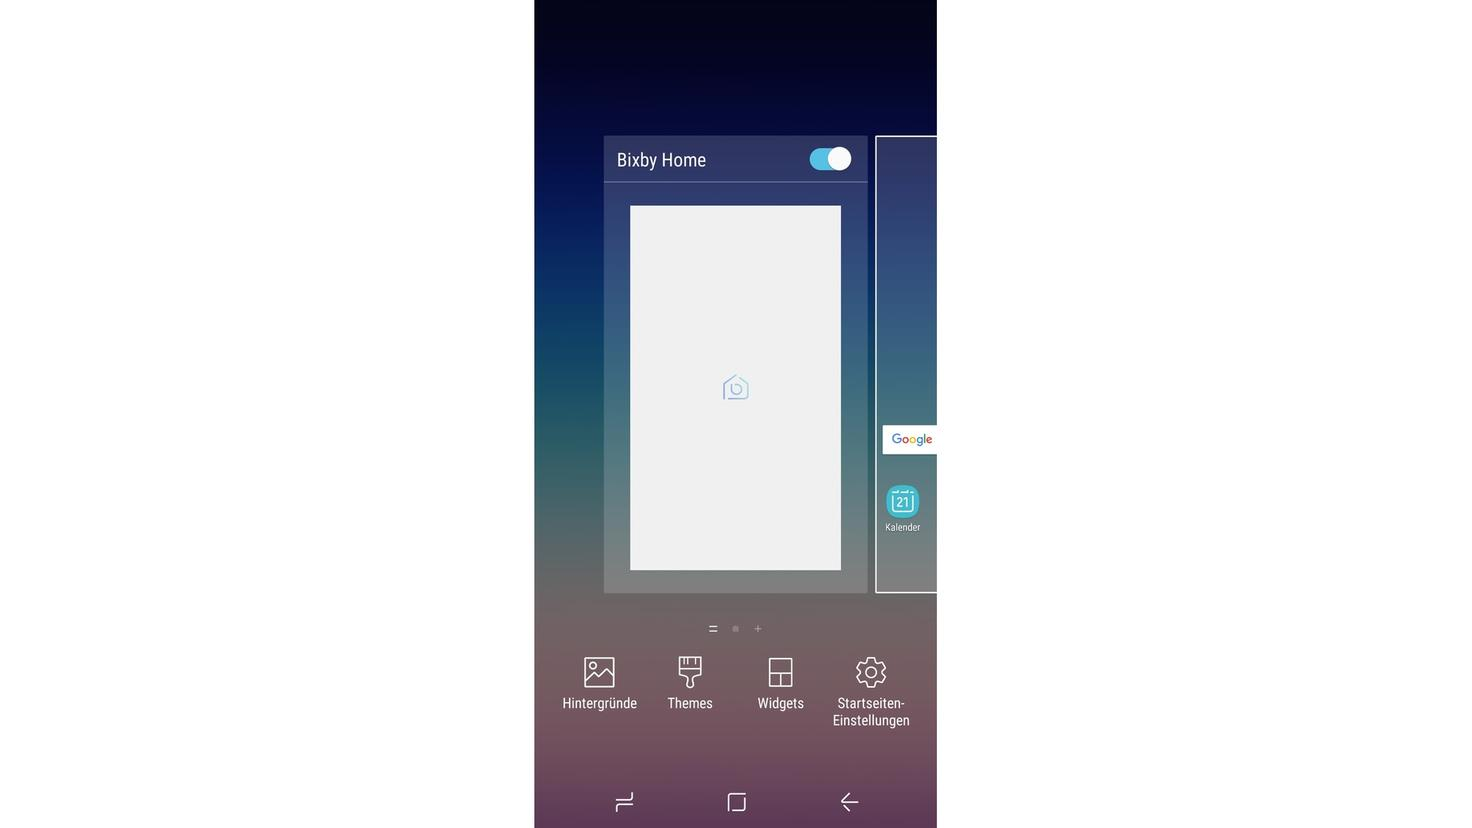 Samsung-Galaxy-A8-Bixby-Home